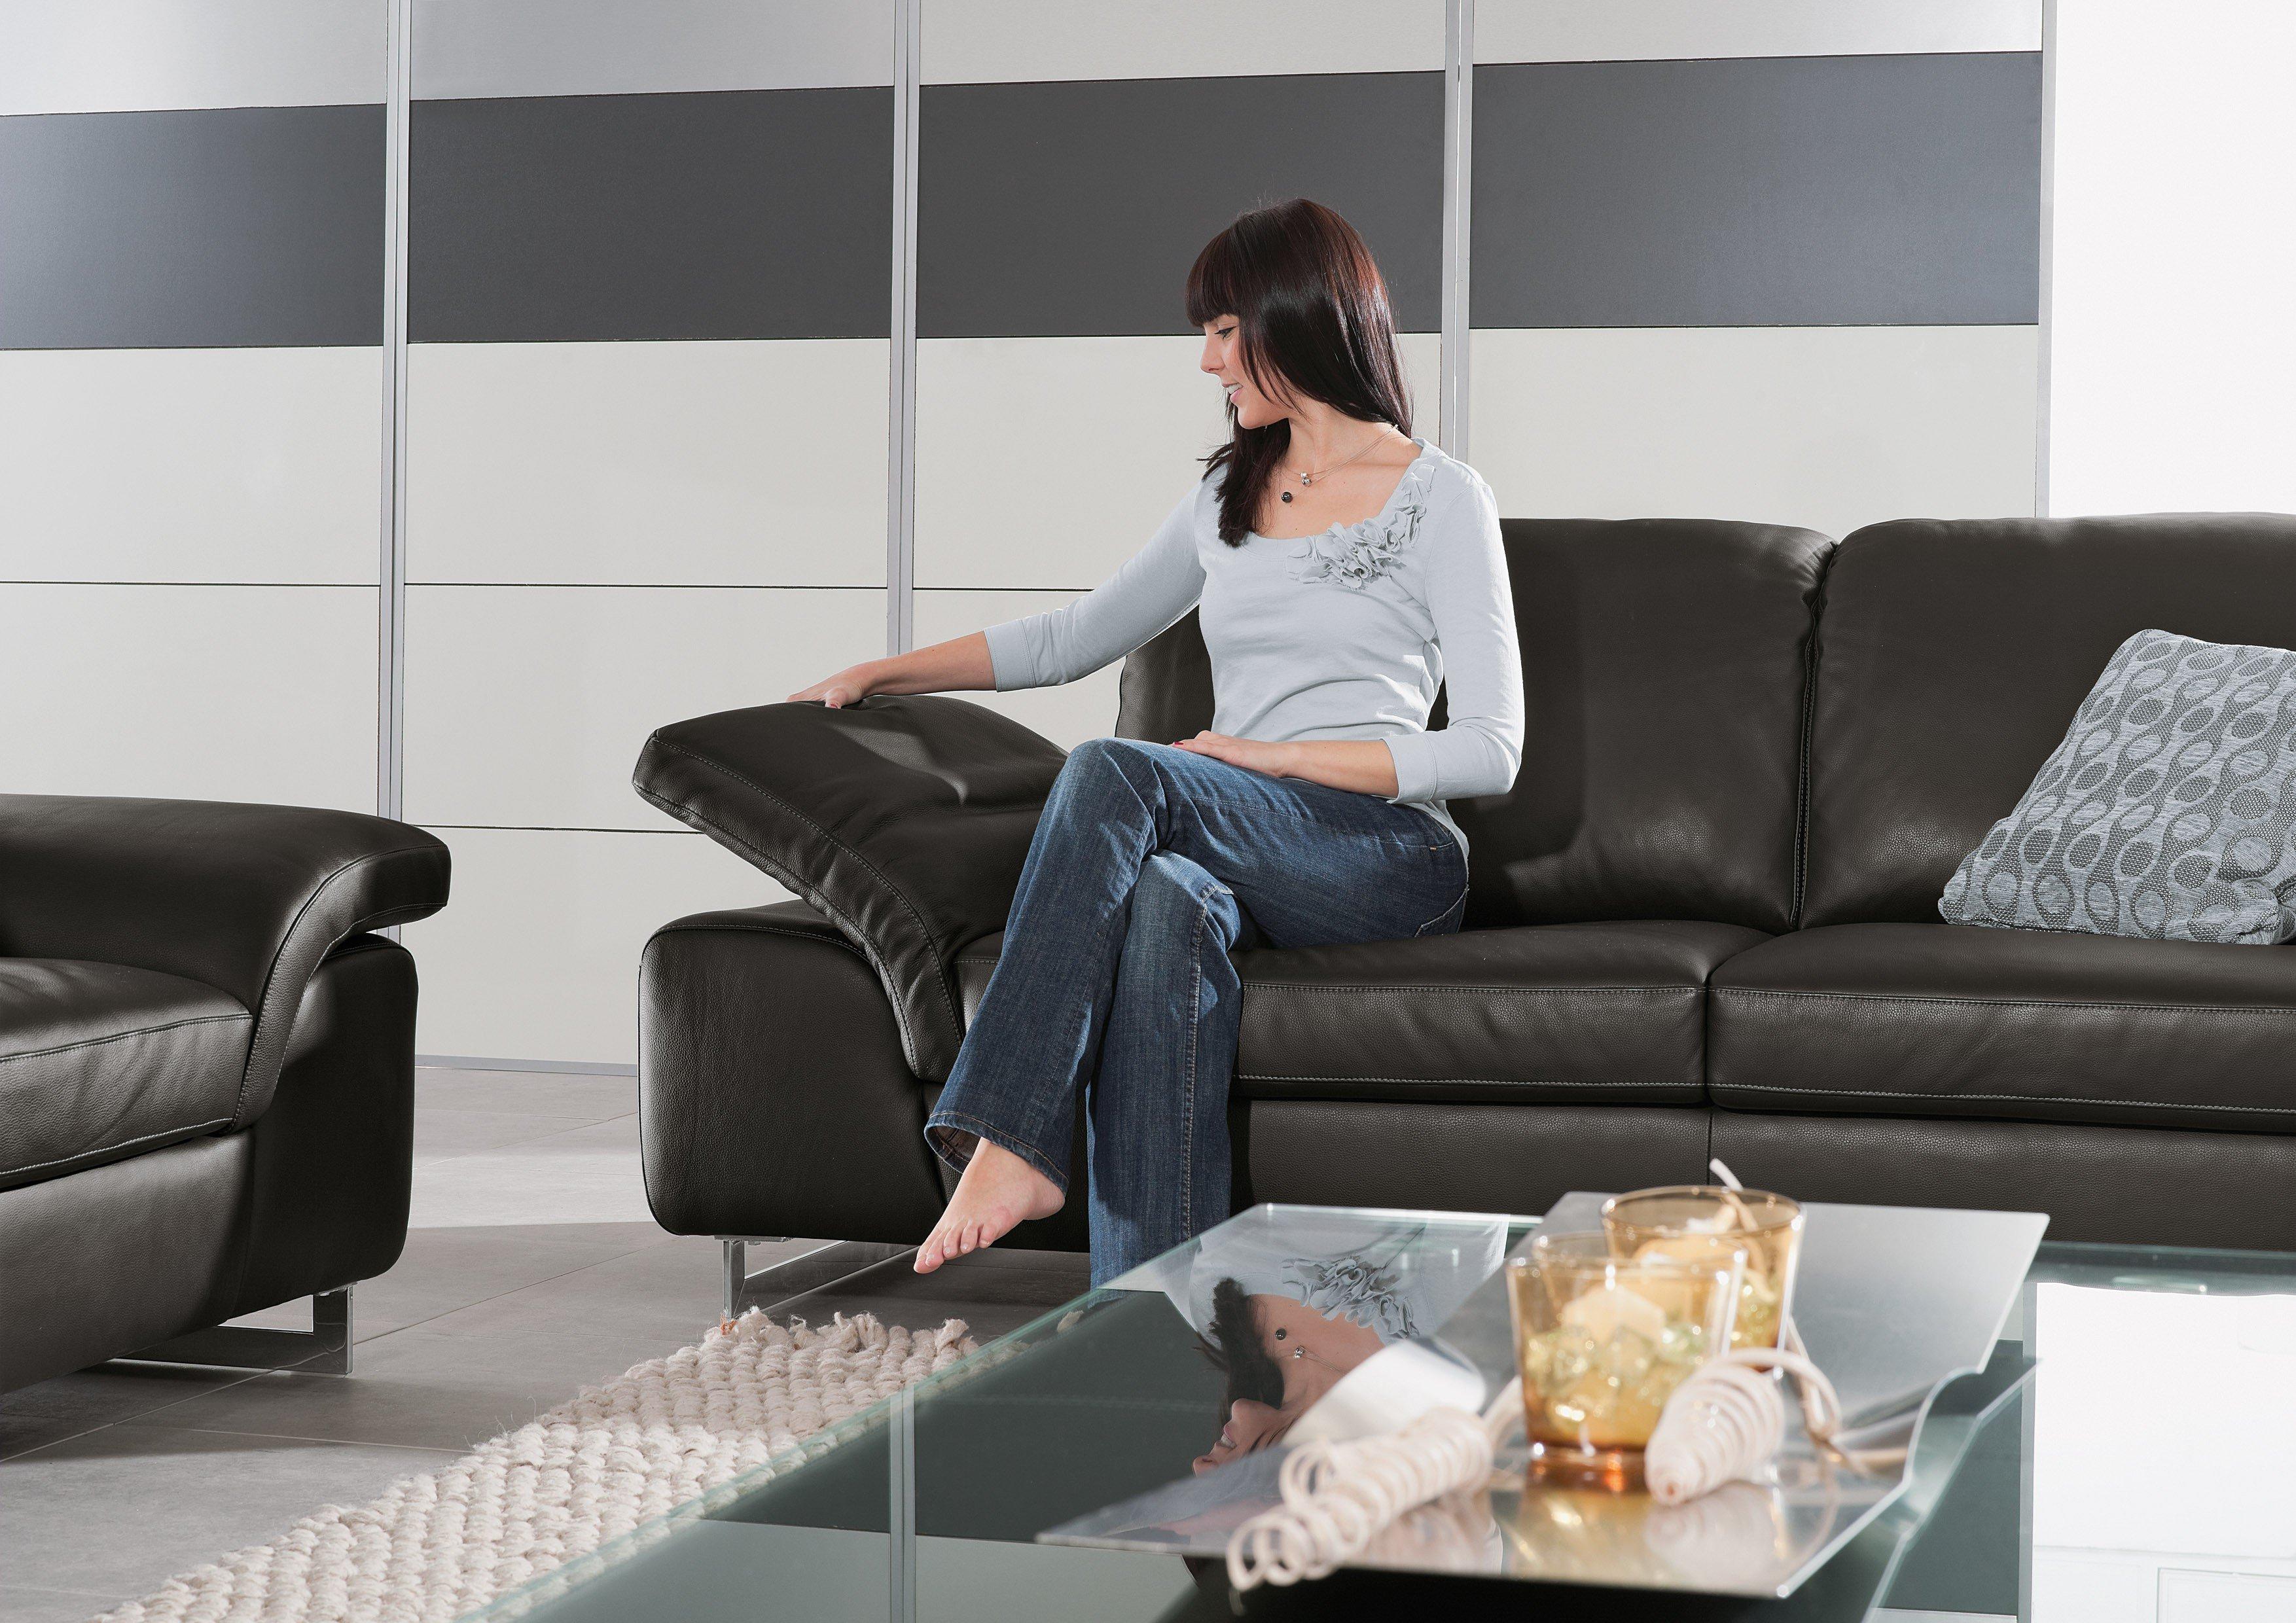 willi schillig 15651 joyzze plus ledergarnitur schwarz m bel letz ihr online shop. Black Bedroom Furniture Sets. Home Design Ideas